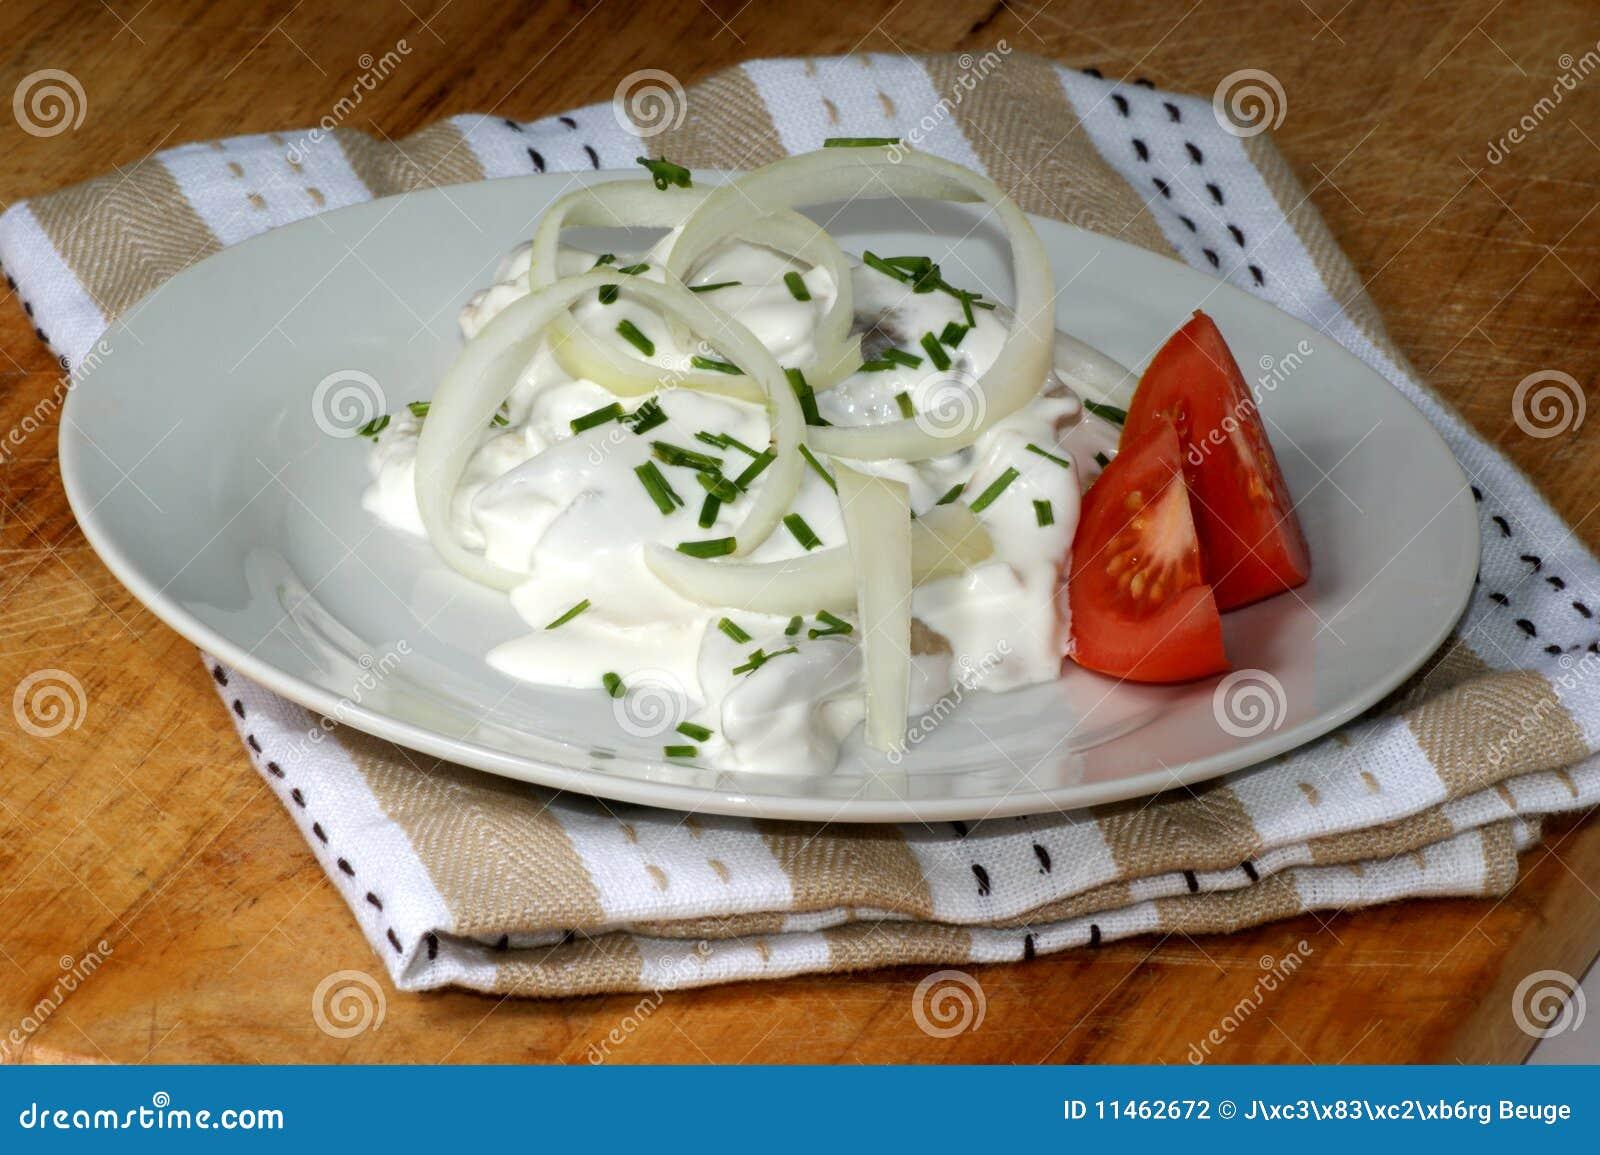 herring in yogurt sauce on a white plate